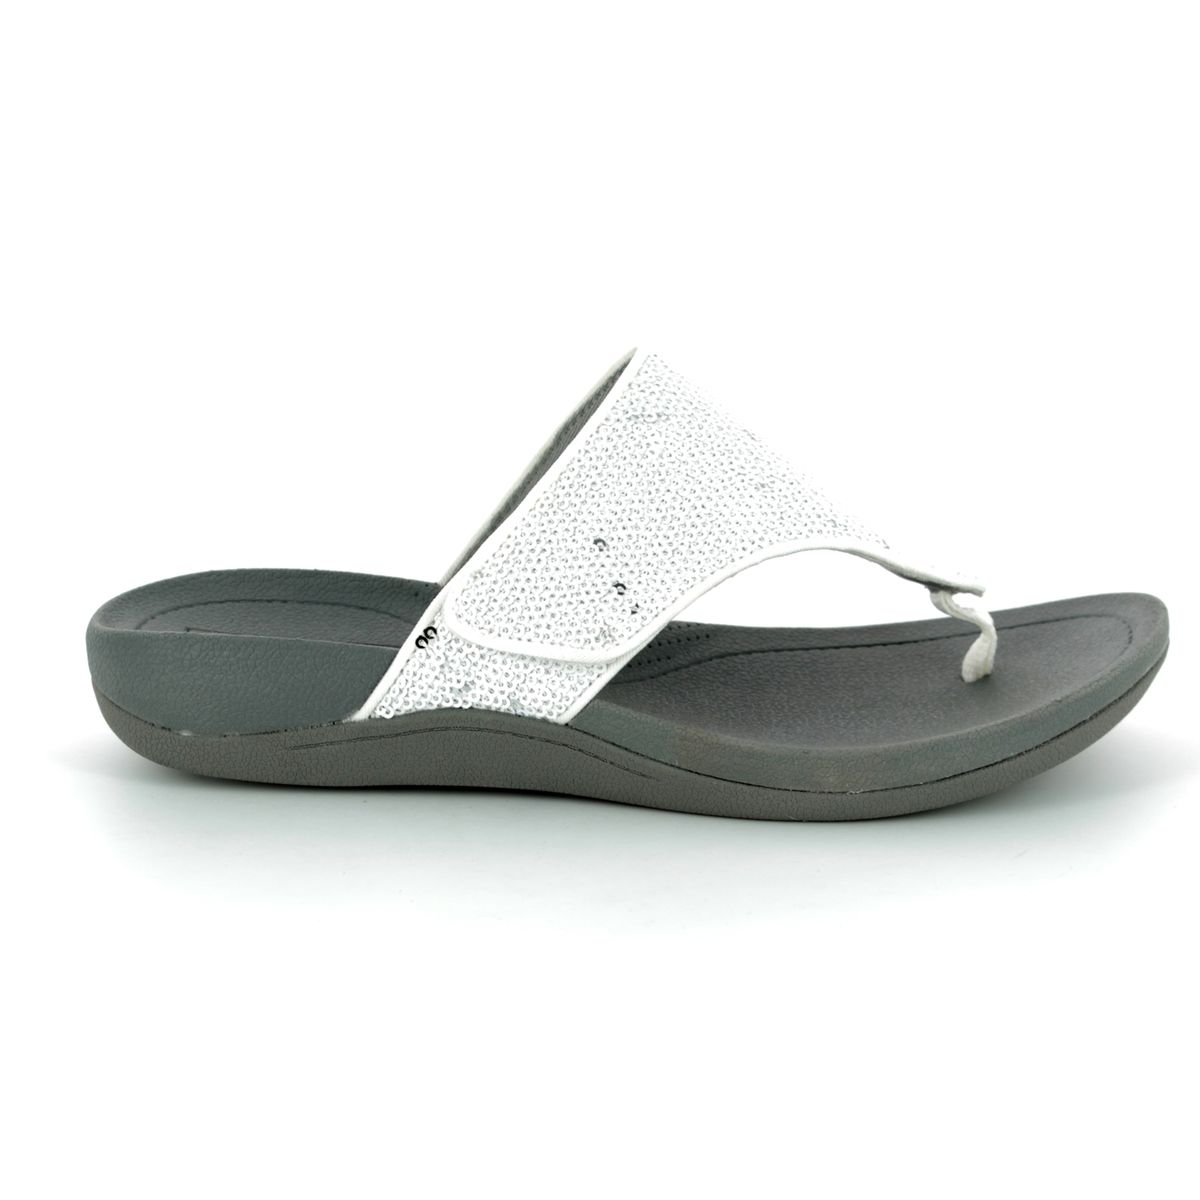 Clarks Pical Lipson - Blanc - Blanc - 6 Au Royaume-uni n7a6Cl6n